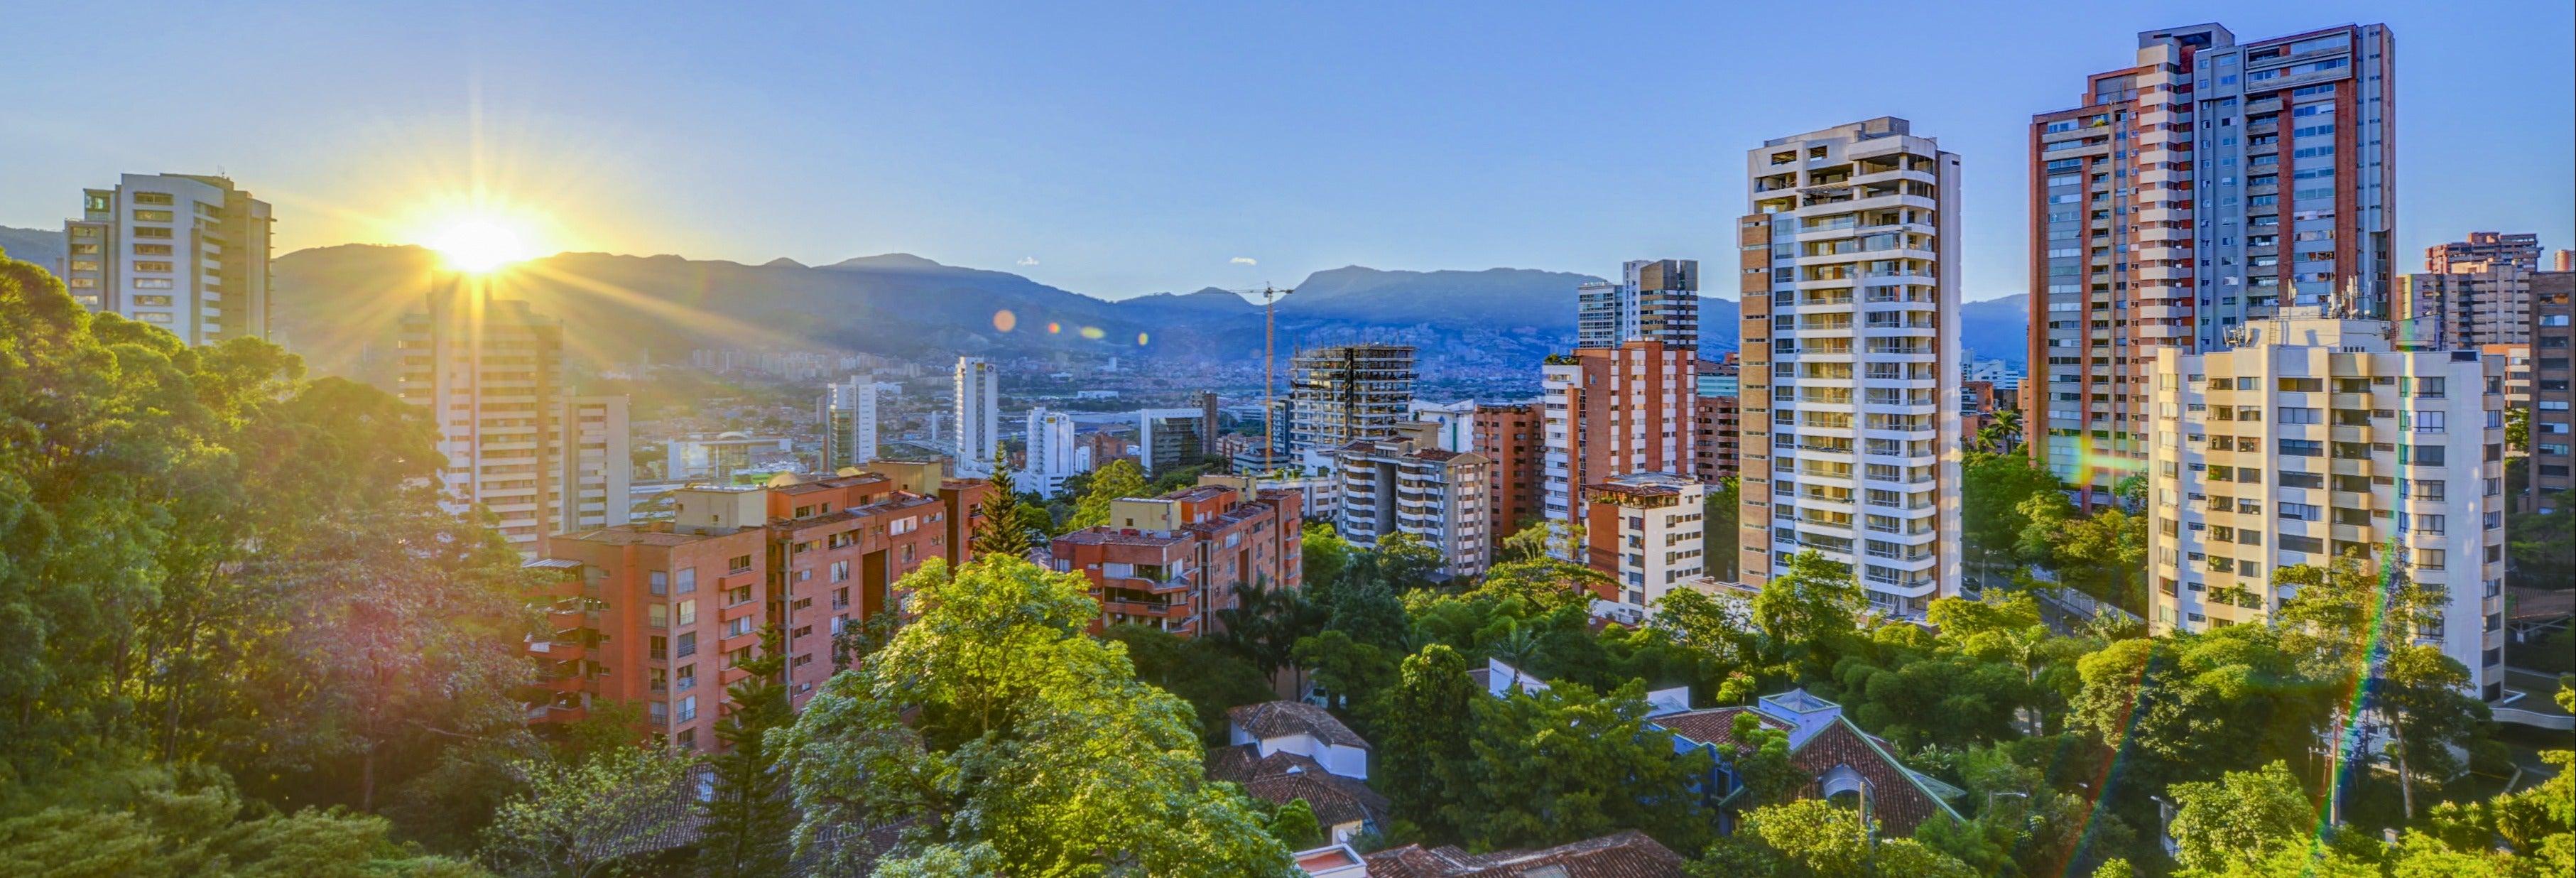 Excursión privada a Medellín